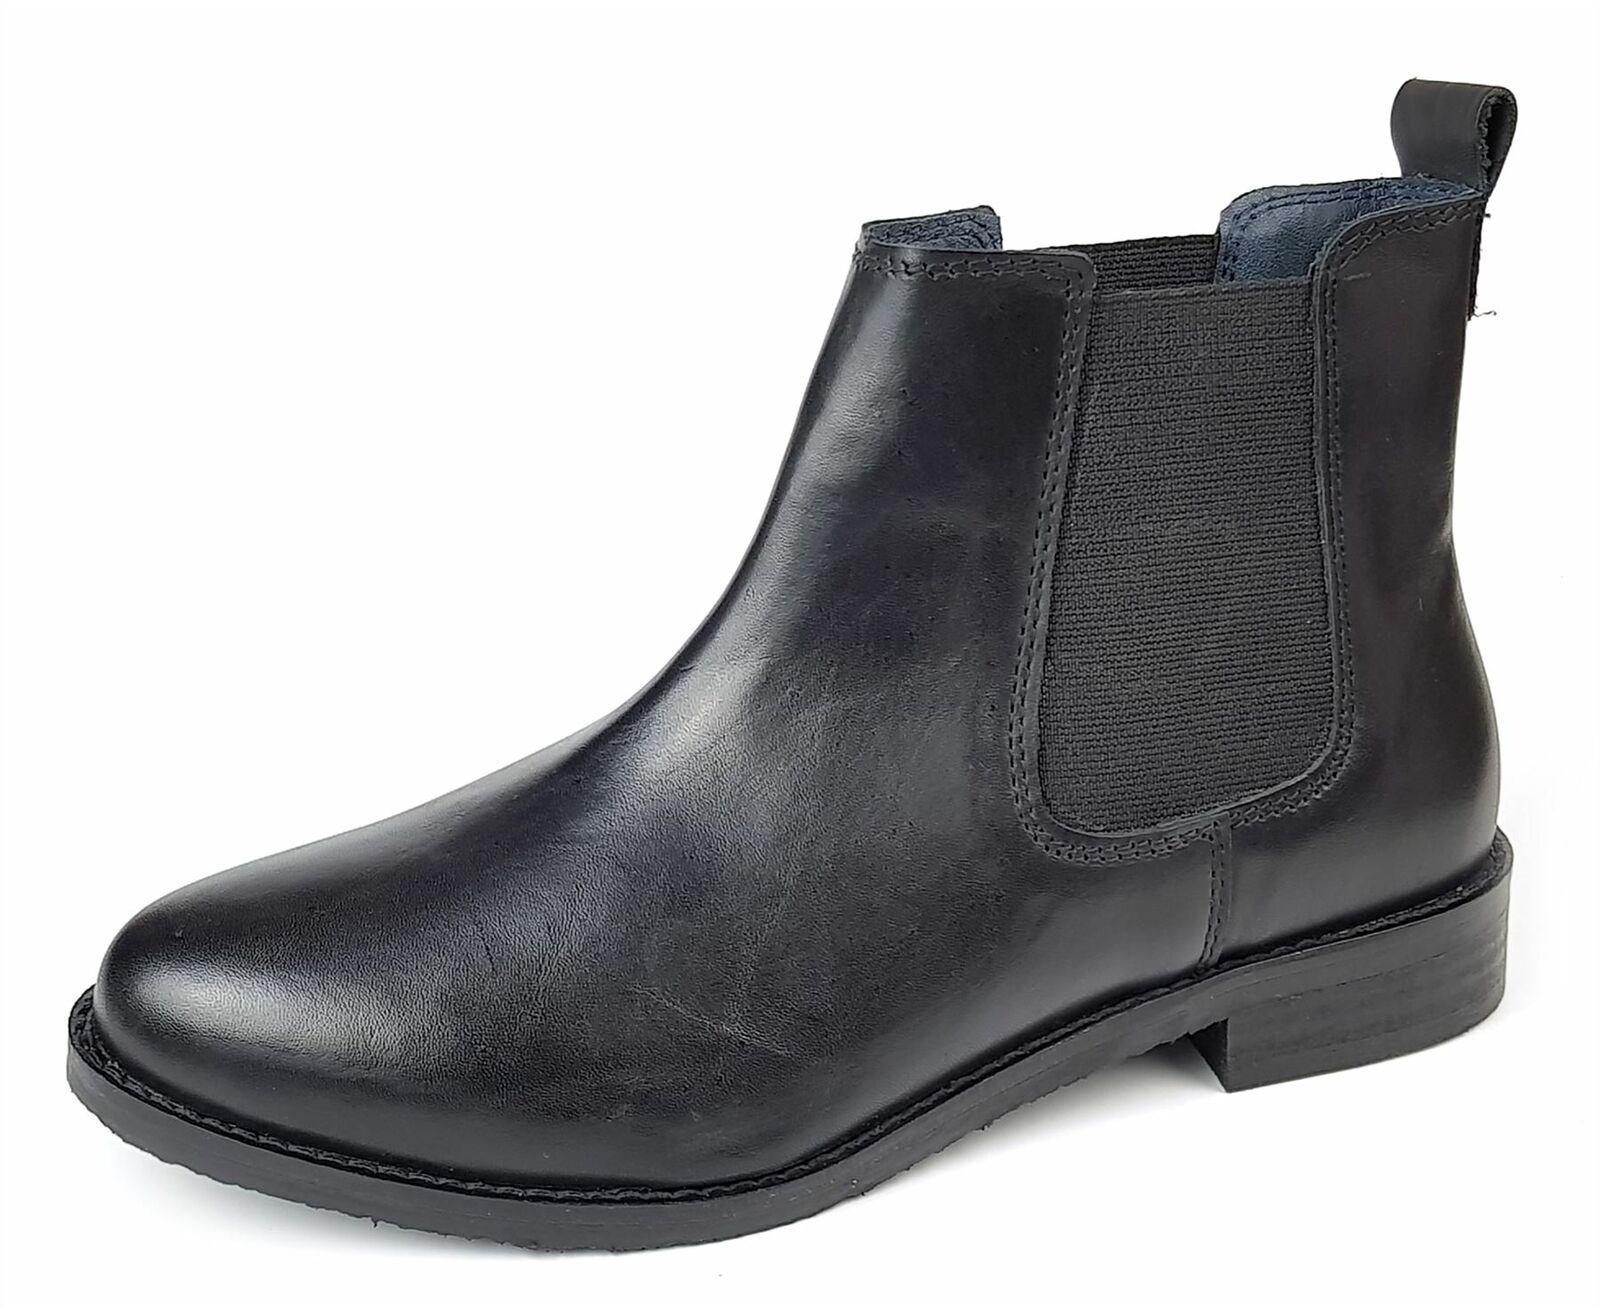 Frank James Aintree Leather Ladies Chelsea Ankle Boots Elgin Black